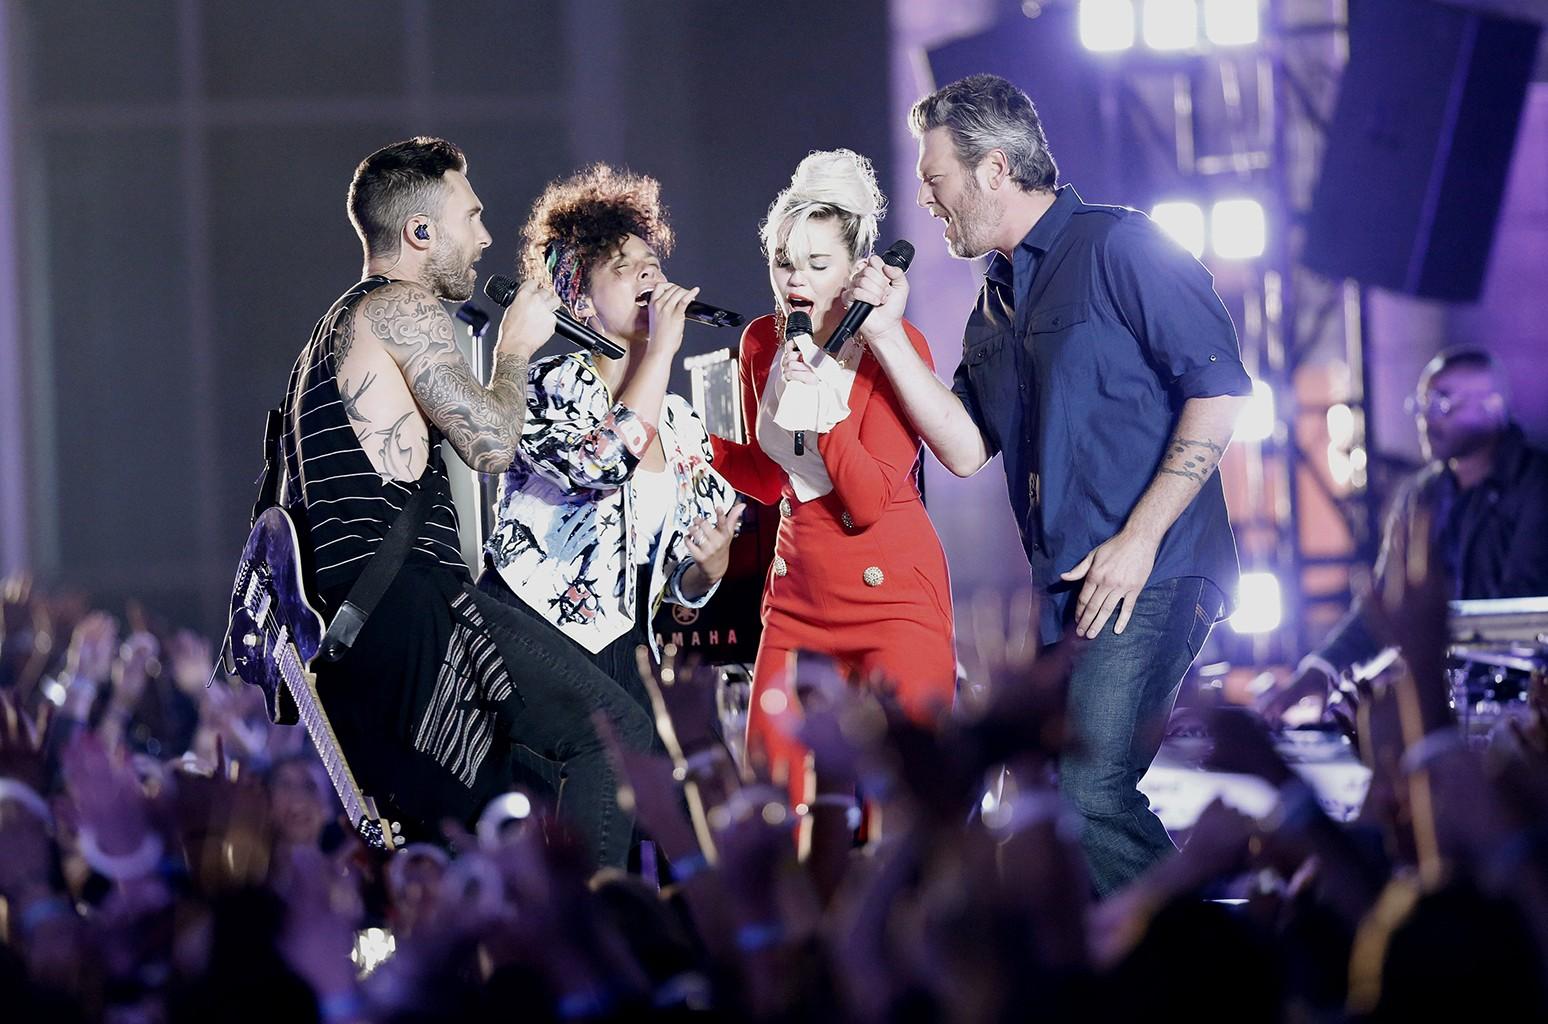 Adam Levine, Alicia Keys, Miley Cyrus and Blake Shelton on The Voice.